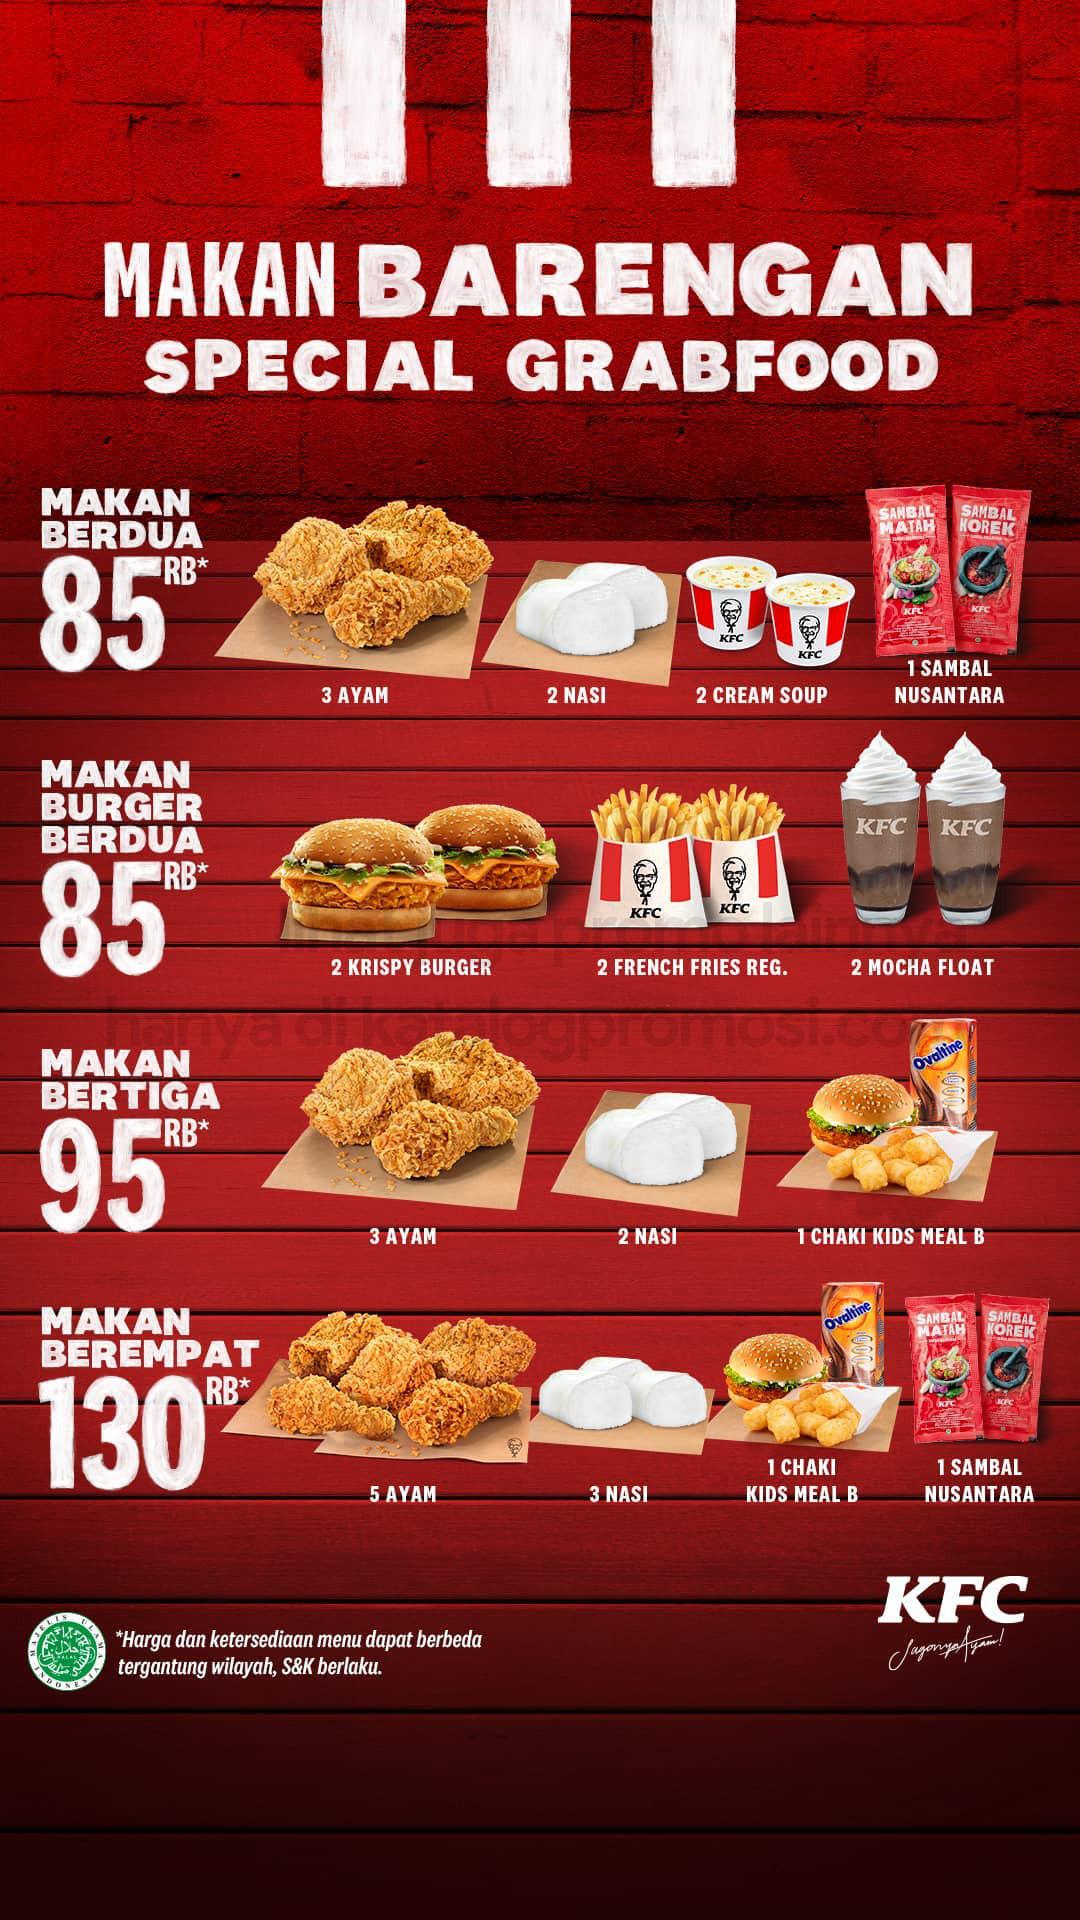 Promo KFC PAKET MAKAN BARENGAN KHUSUS PEMESANAN via GOFOOD/GRABFOOD